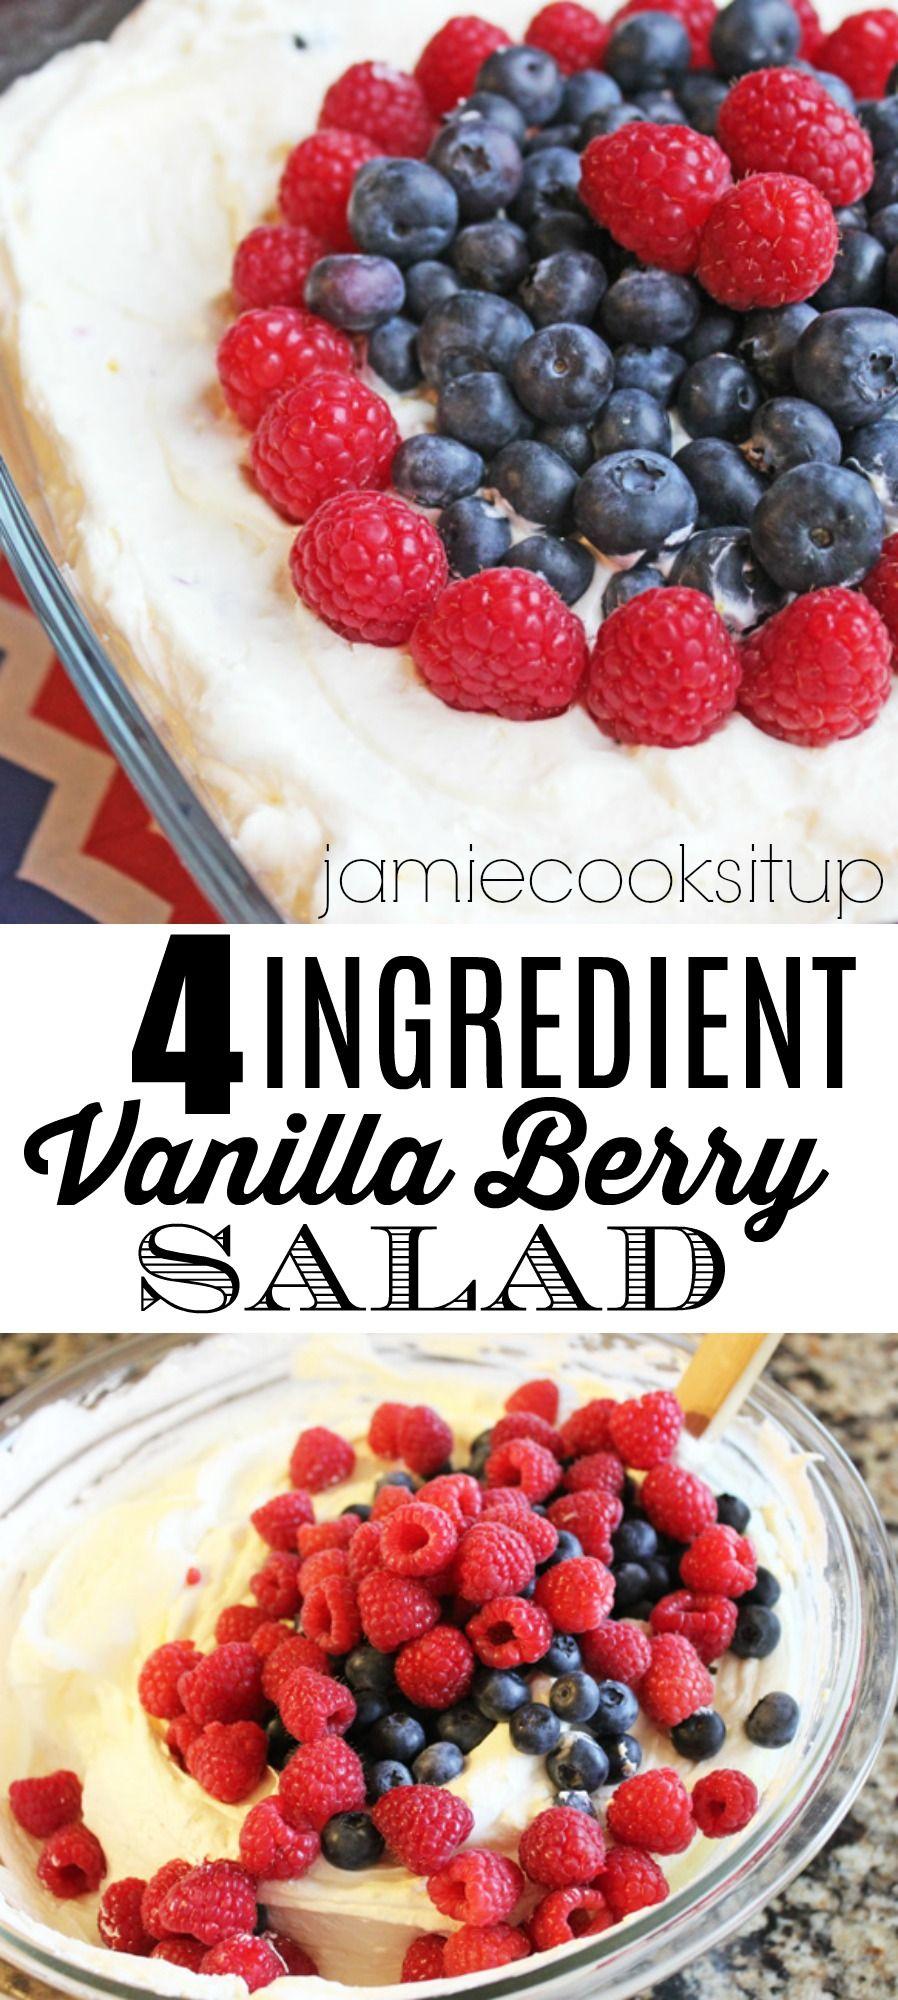 Creamy Vanilla Berry Salad